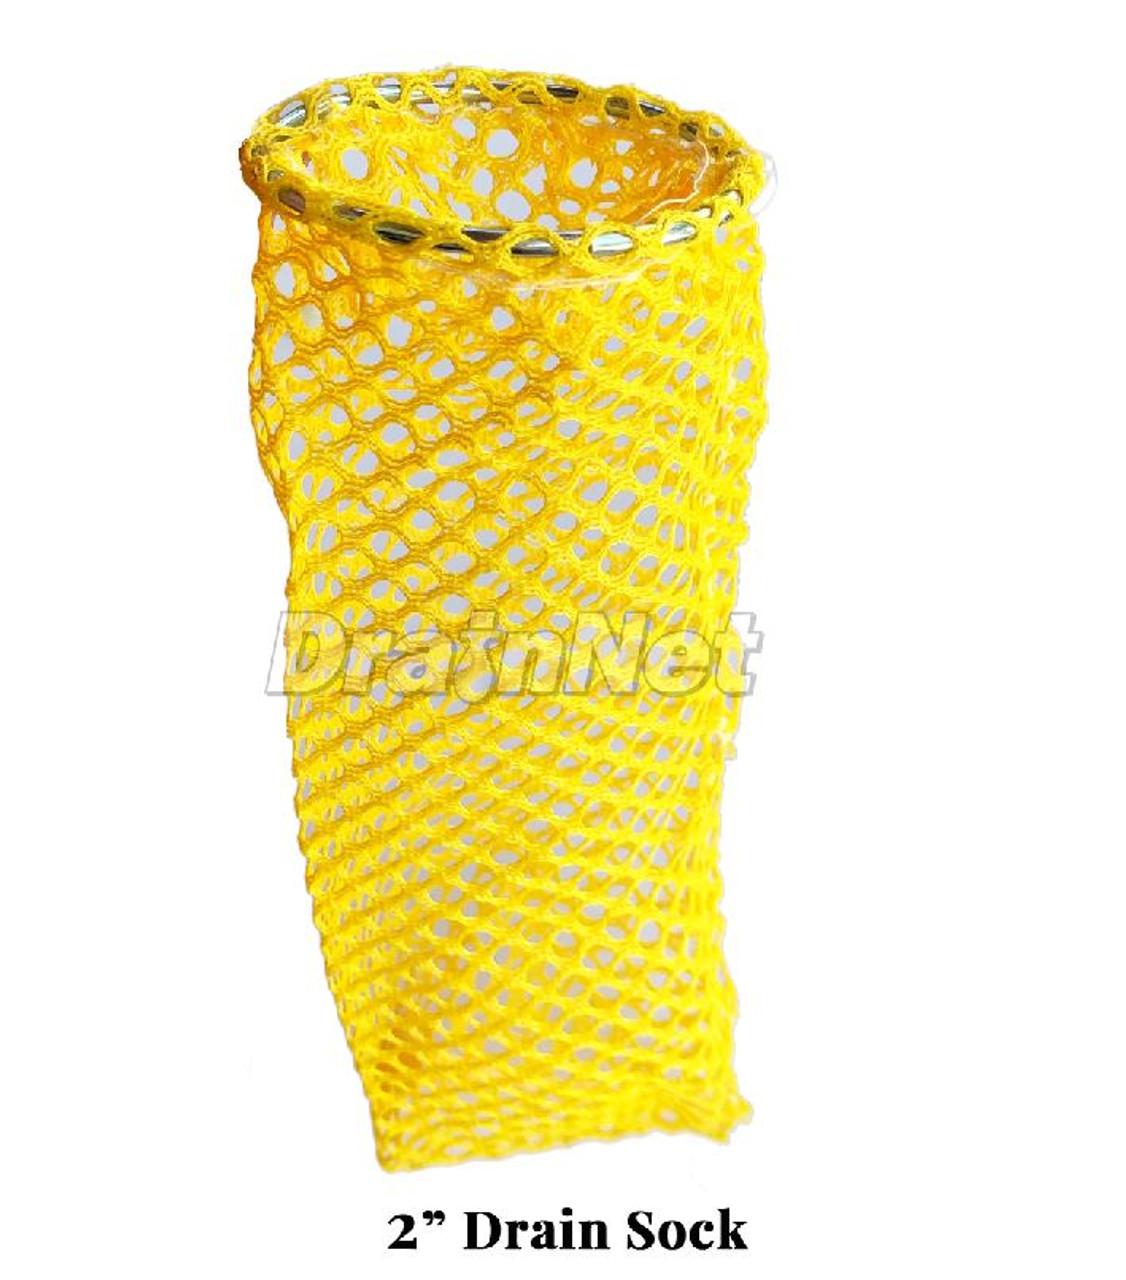 Yellow Flexible Drain Sock - 2 inch for restaurant floor drains